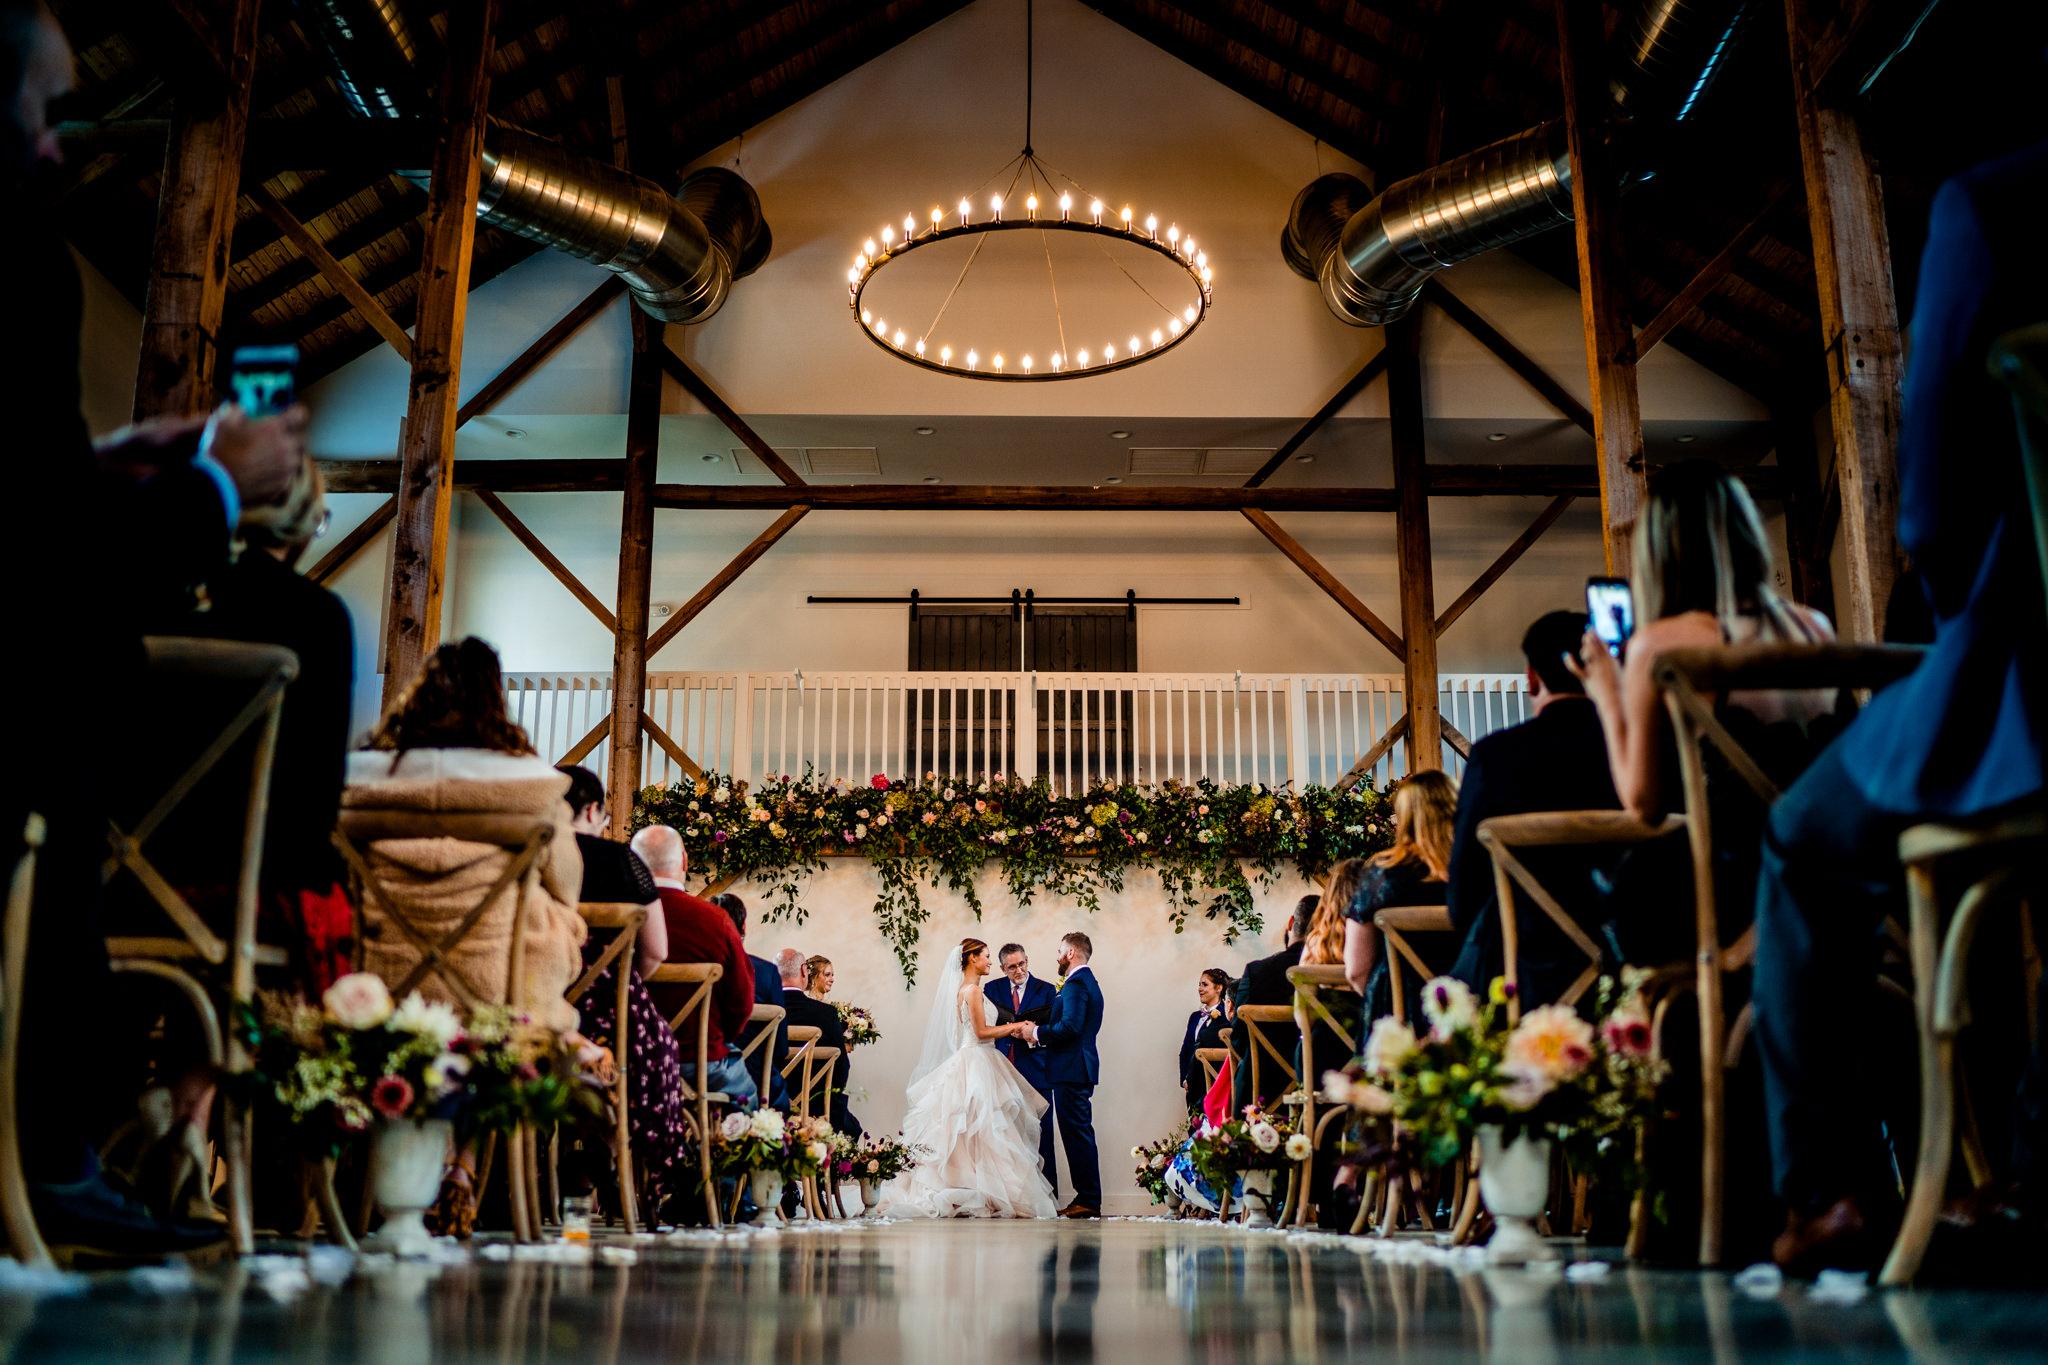 Emily&Ron-Chapel-hill-wedding-barn-32.jpg